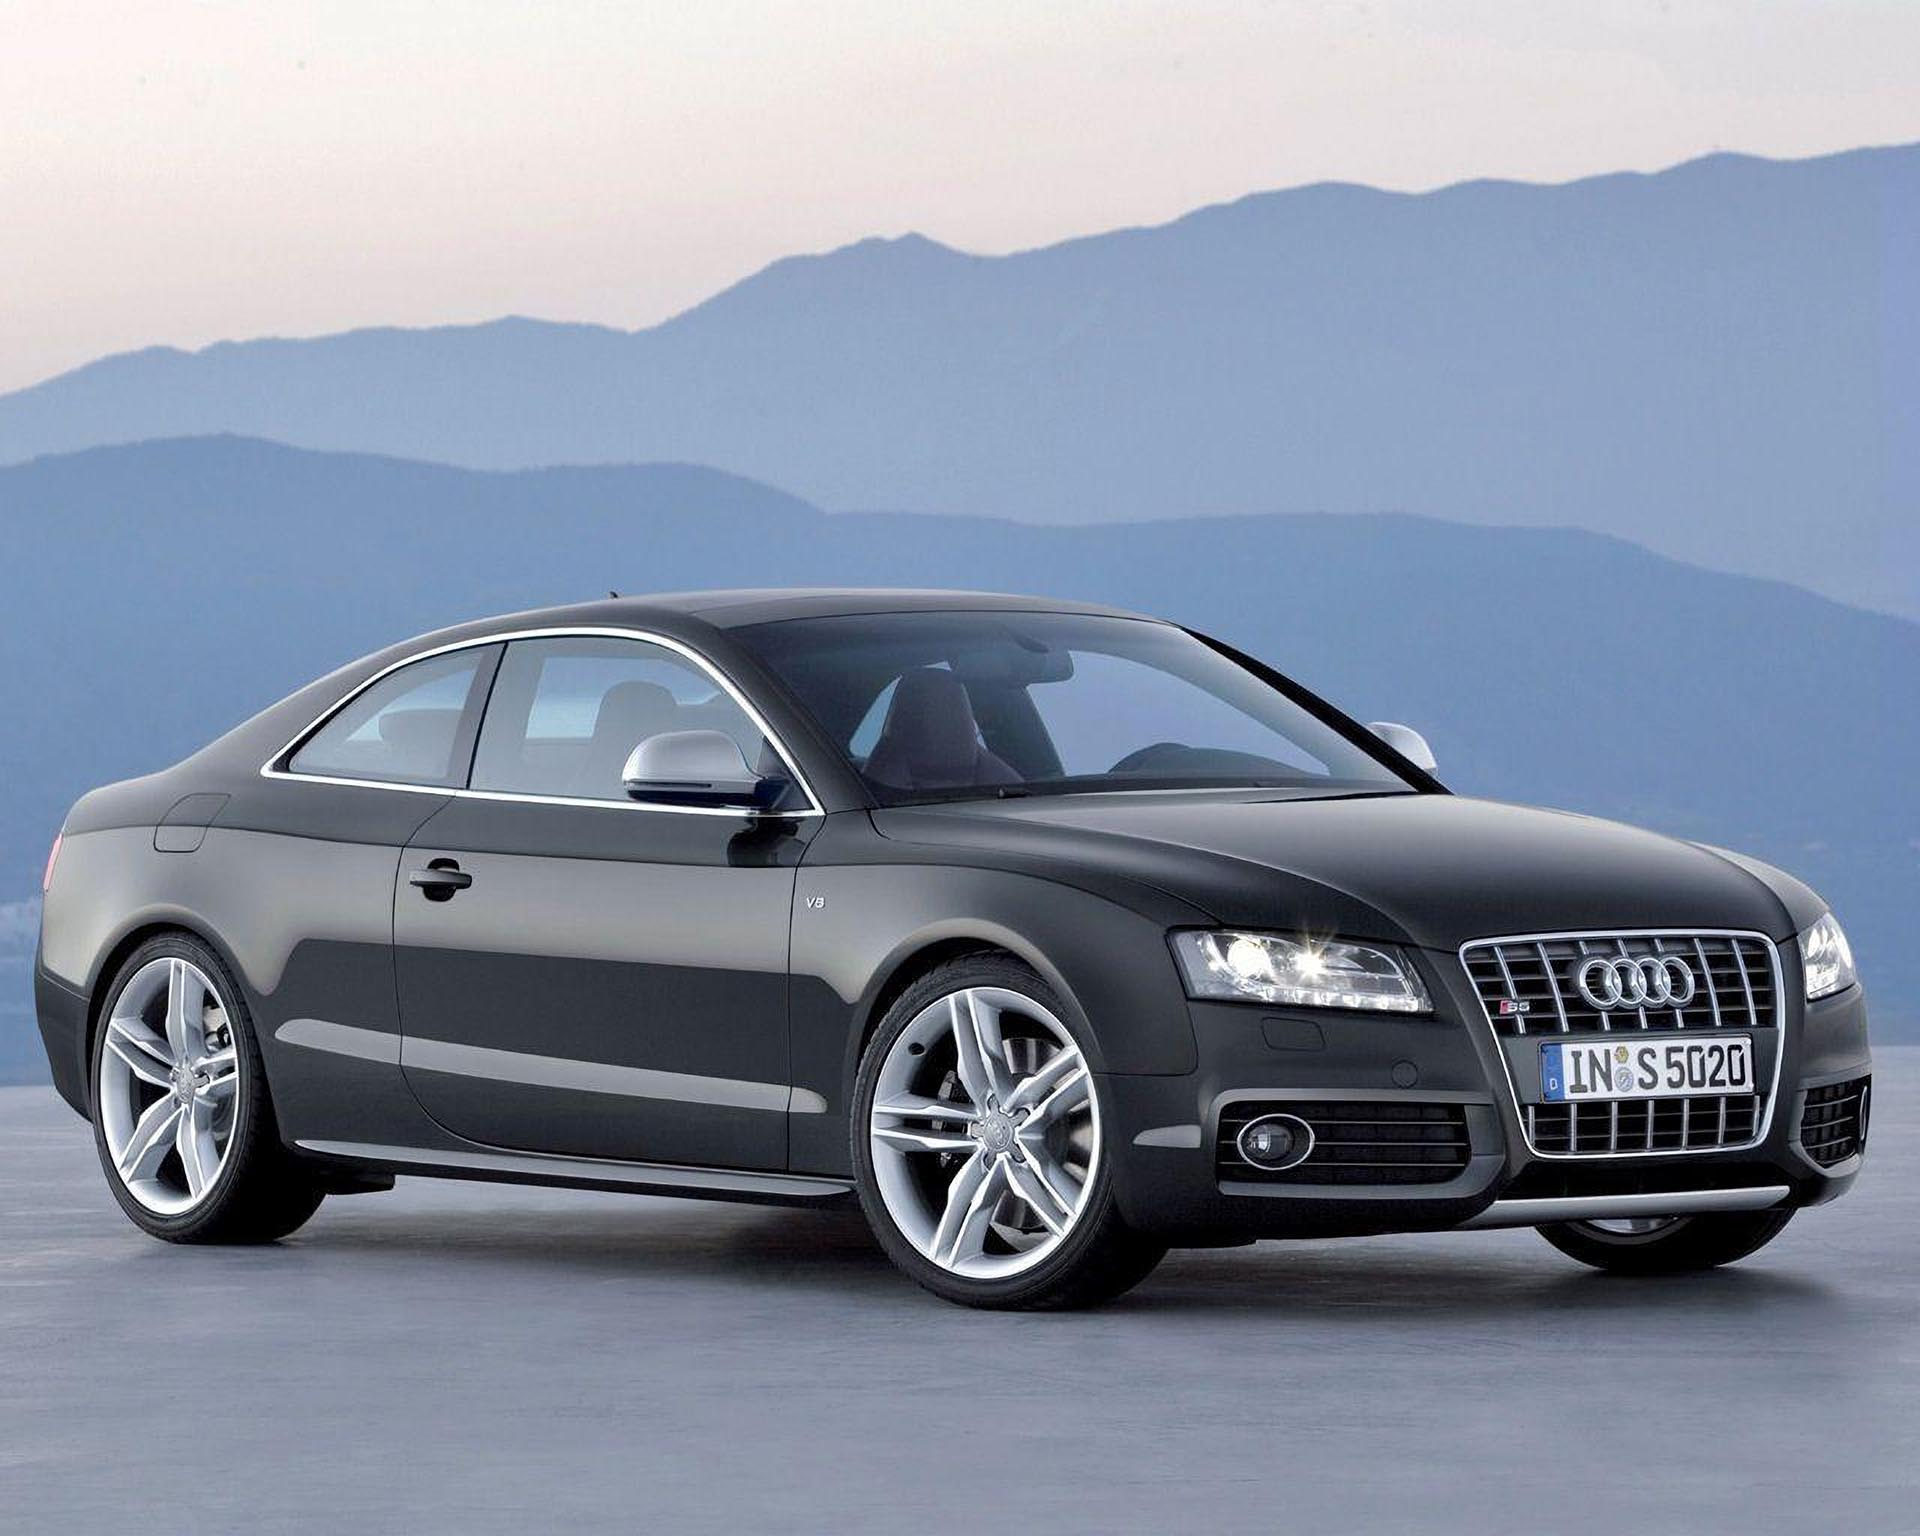 06_Audi B8 S5 4.2 V8 front